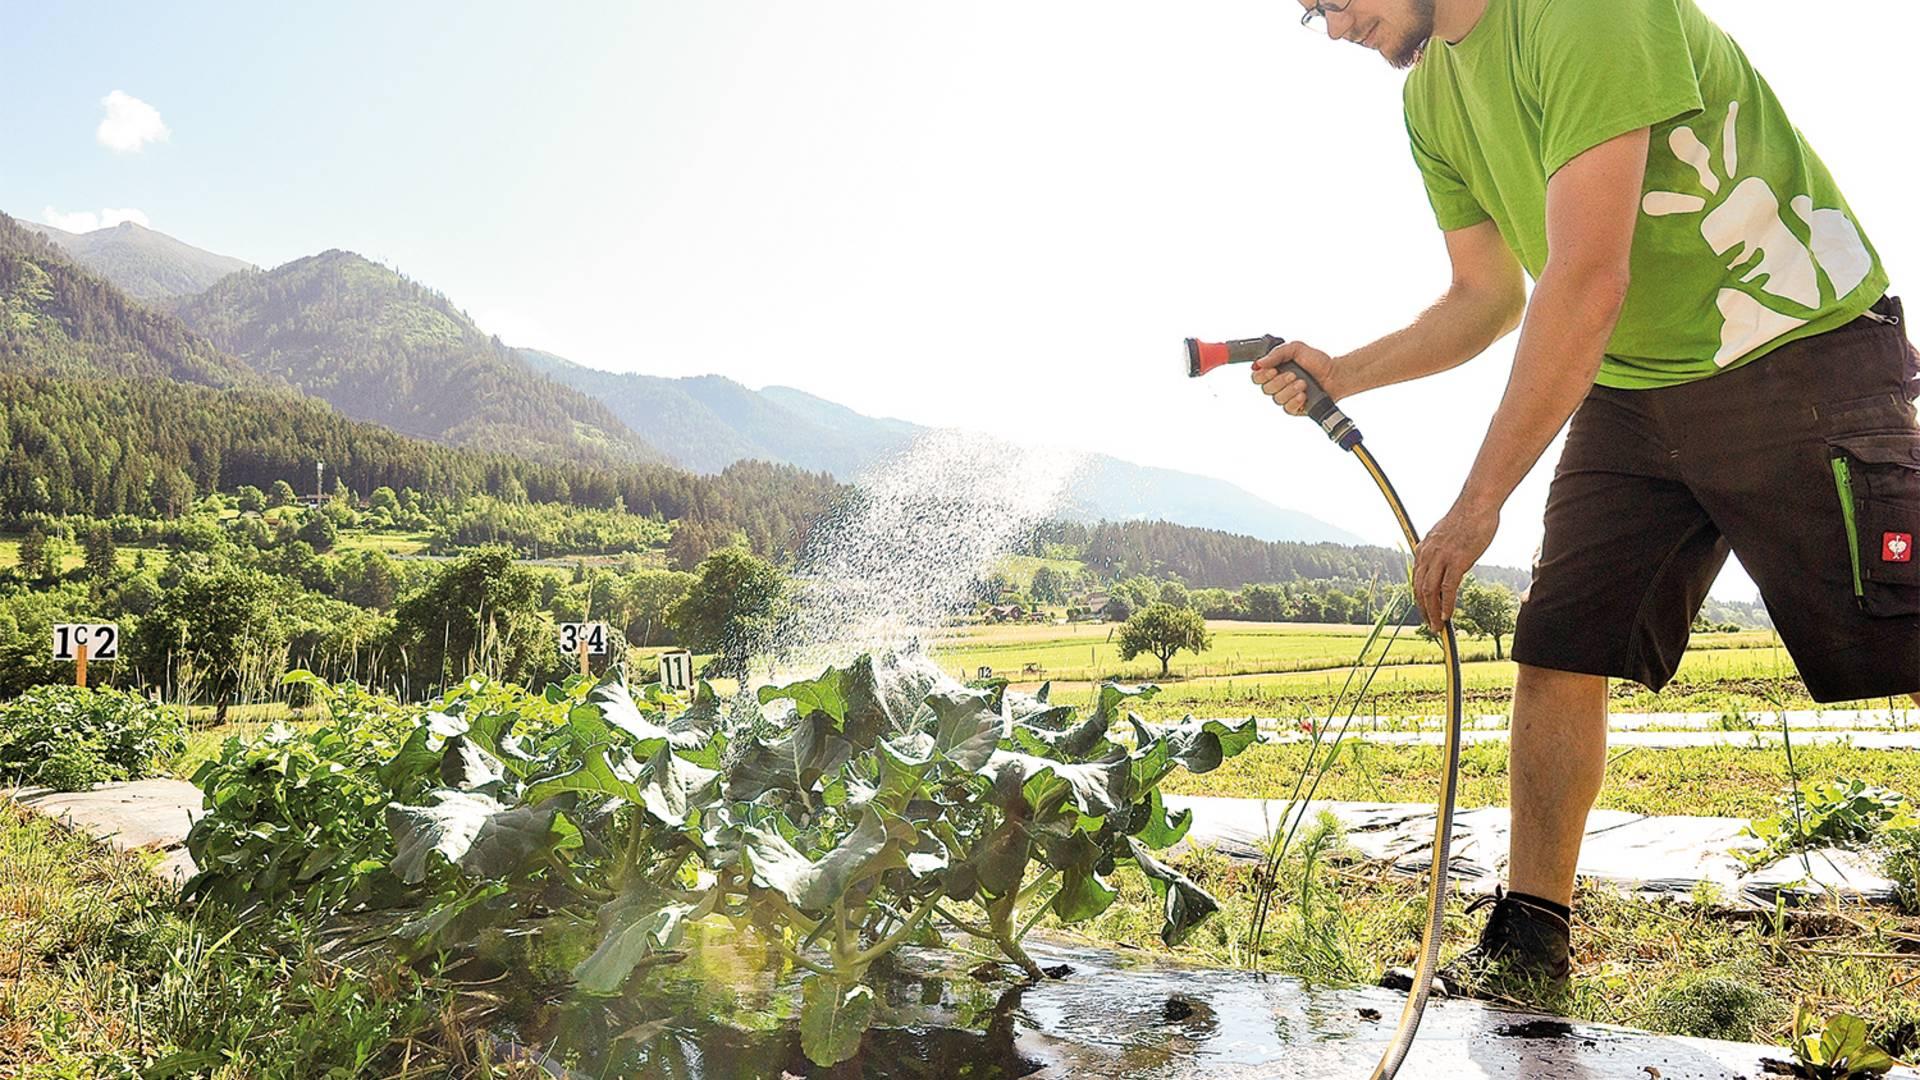 myAcker.com regelmäßiges Gießen der Pflanzen